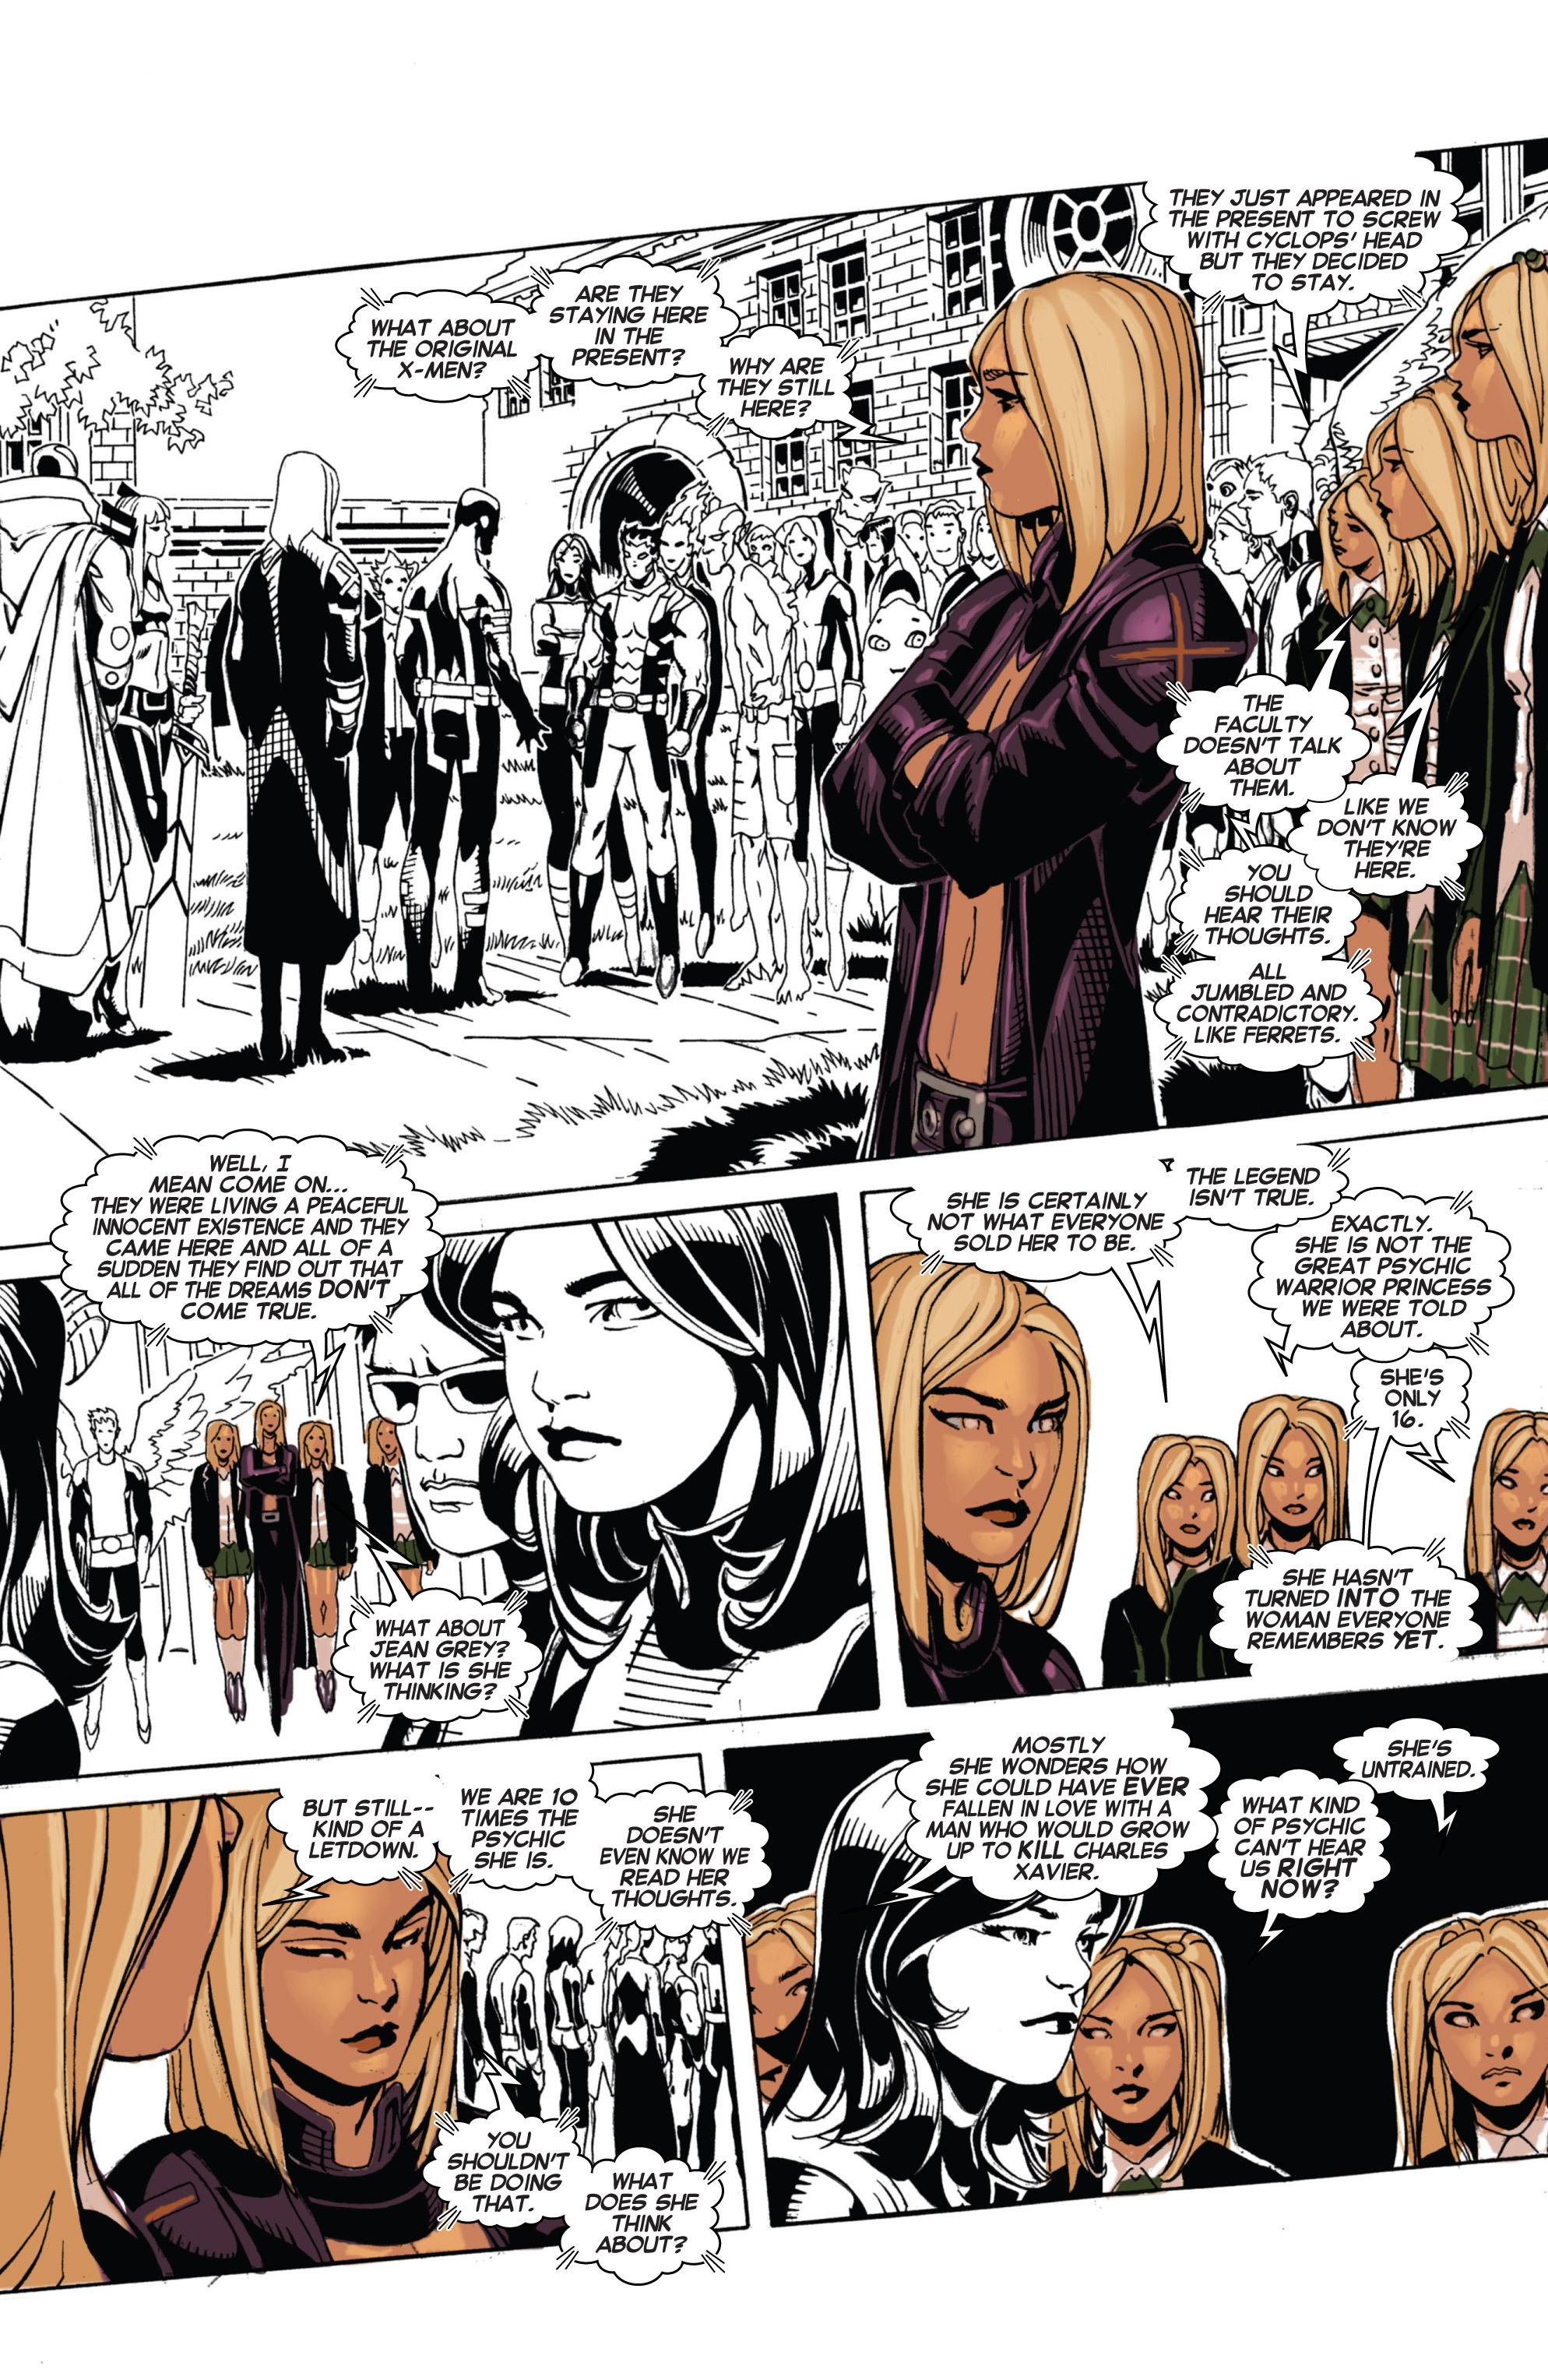 Read online Uncanny X-Men (2013) comic -  Issue # _TPB 1 - Revolution - 74